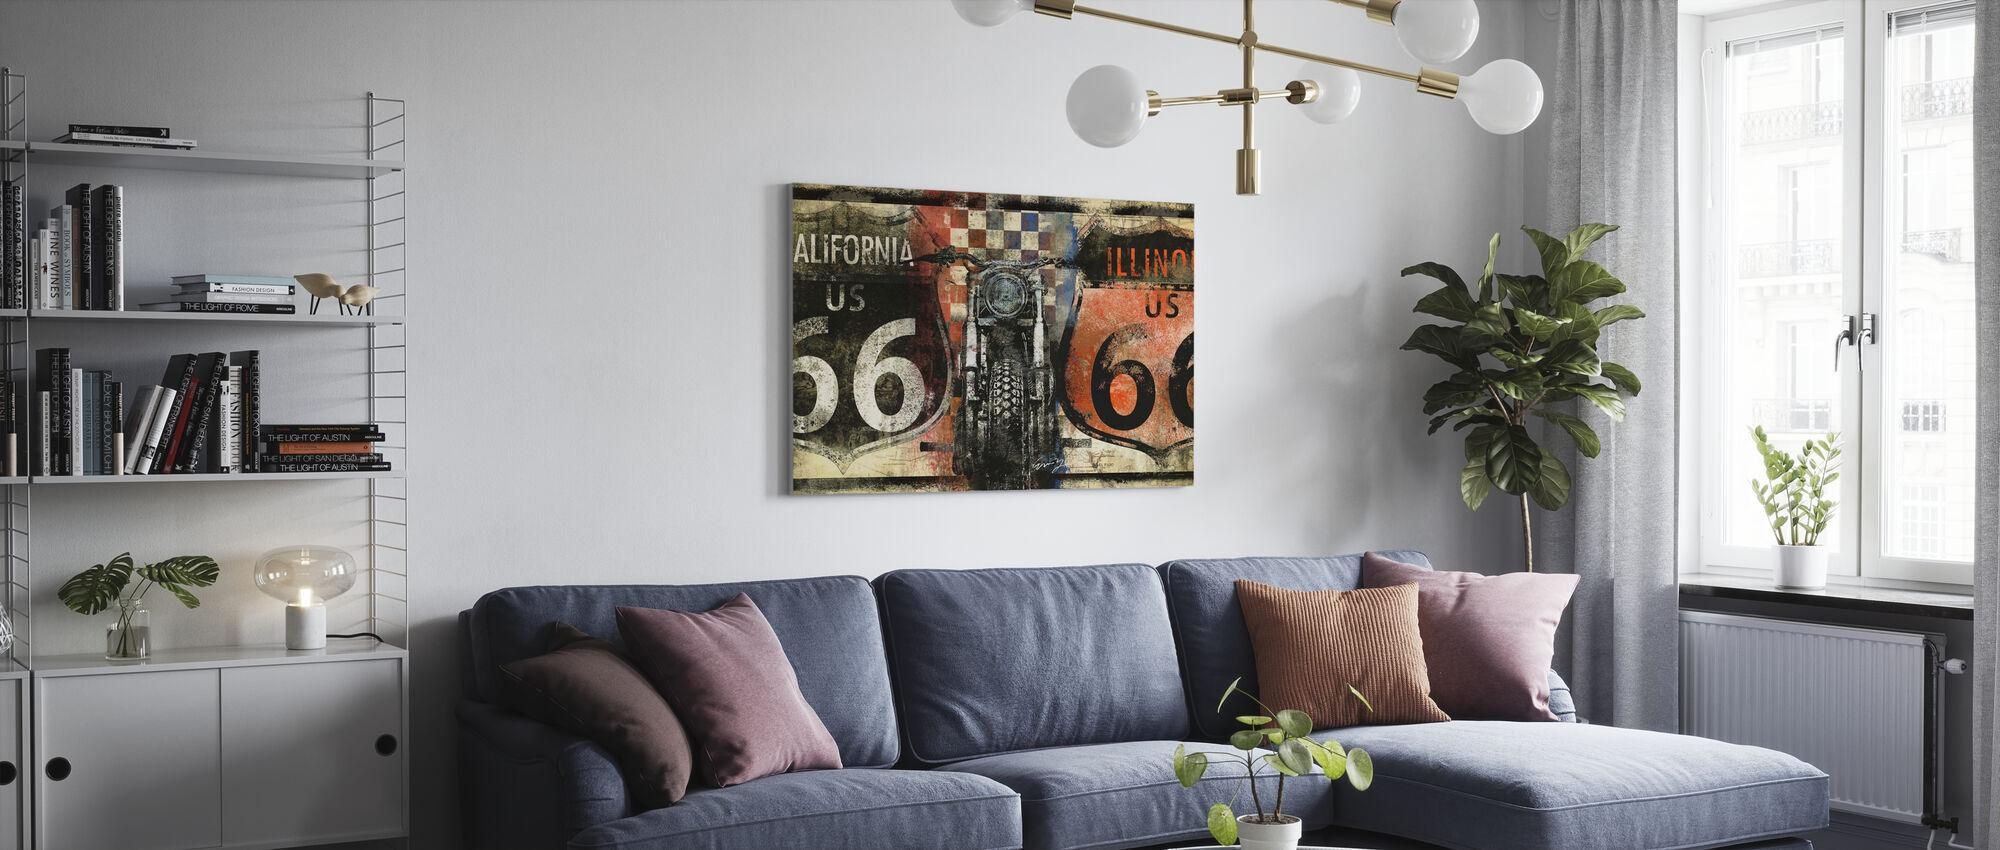 Route 66 California - Canvas print - Living Room